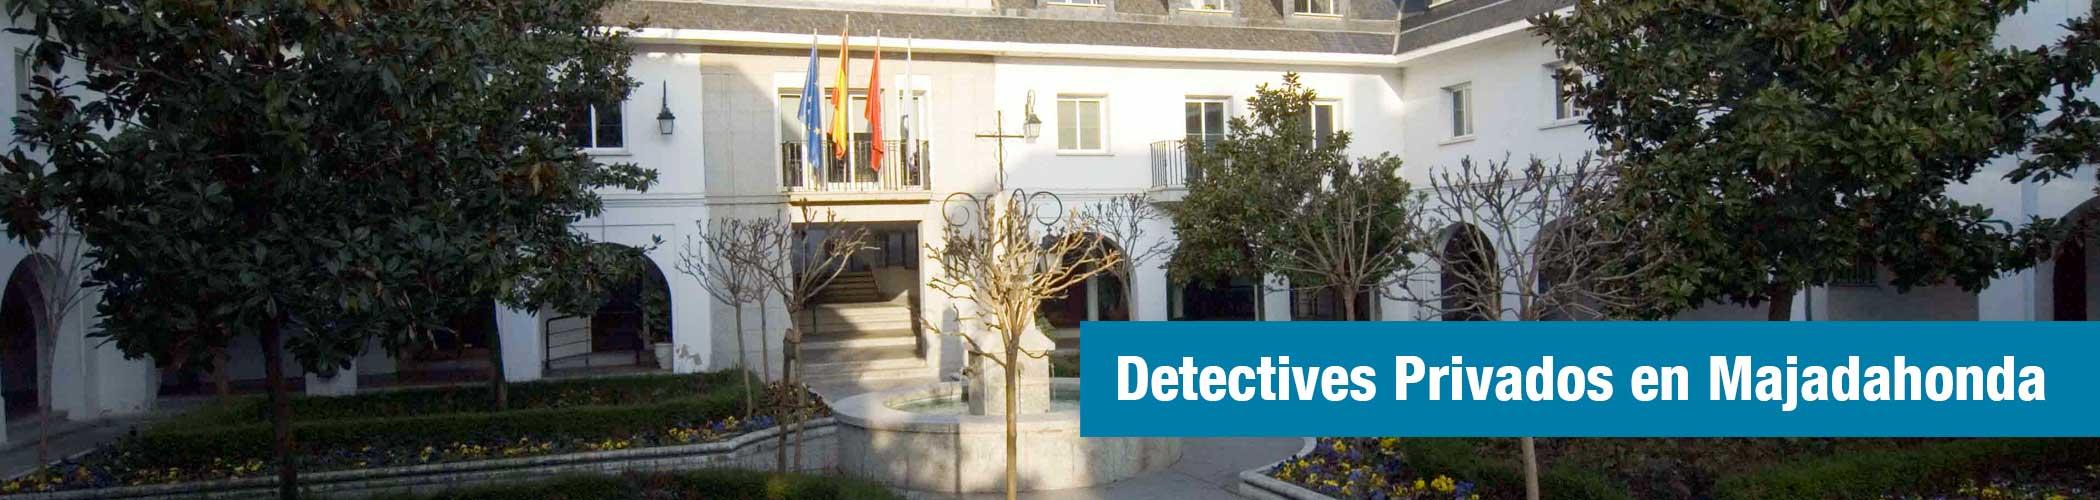 Detectives en Majadahonda